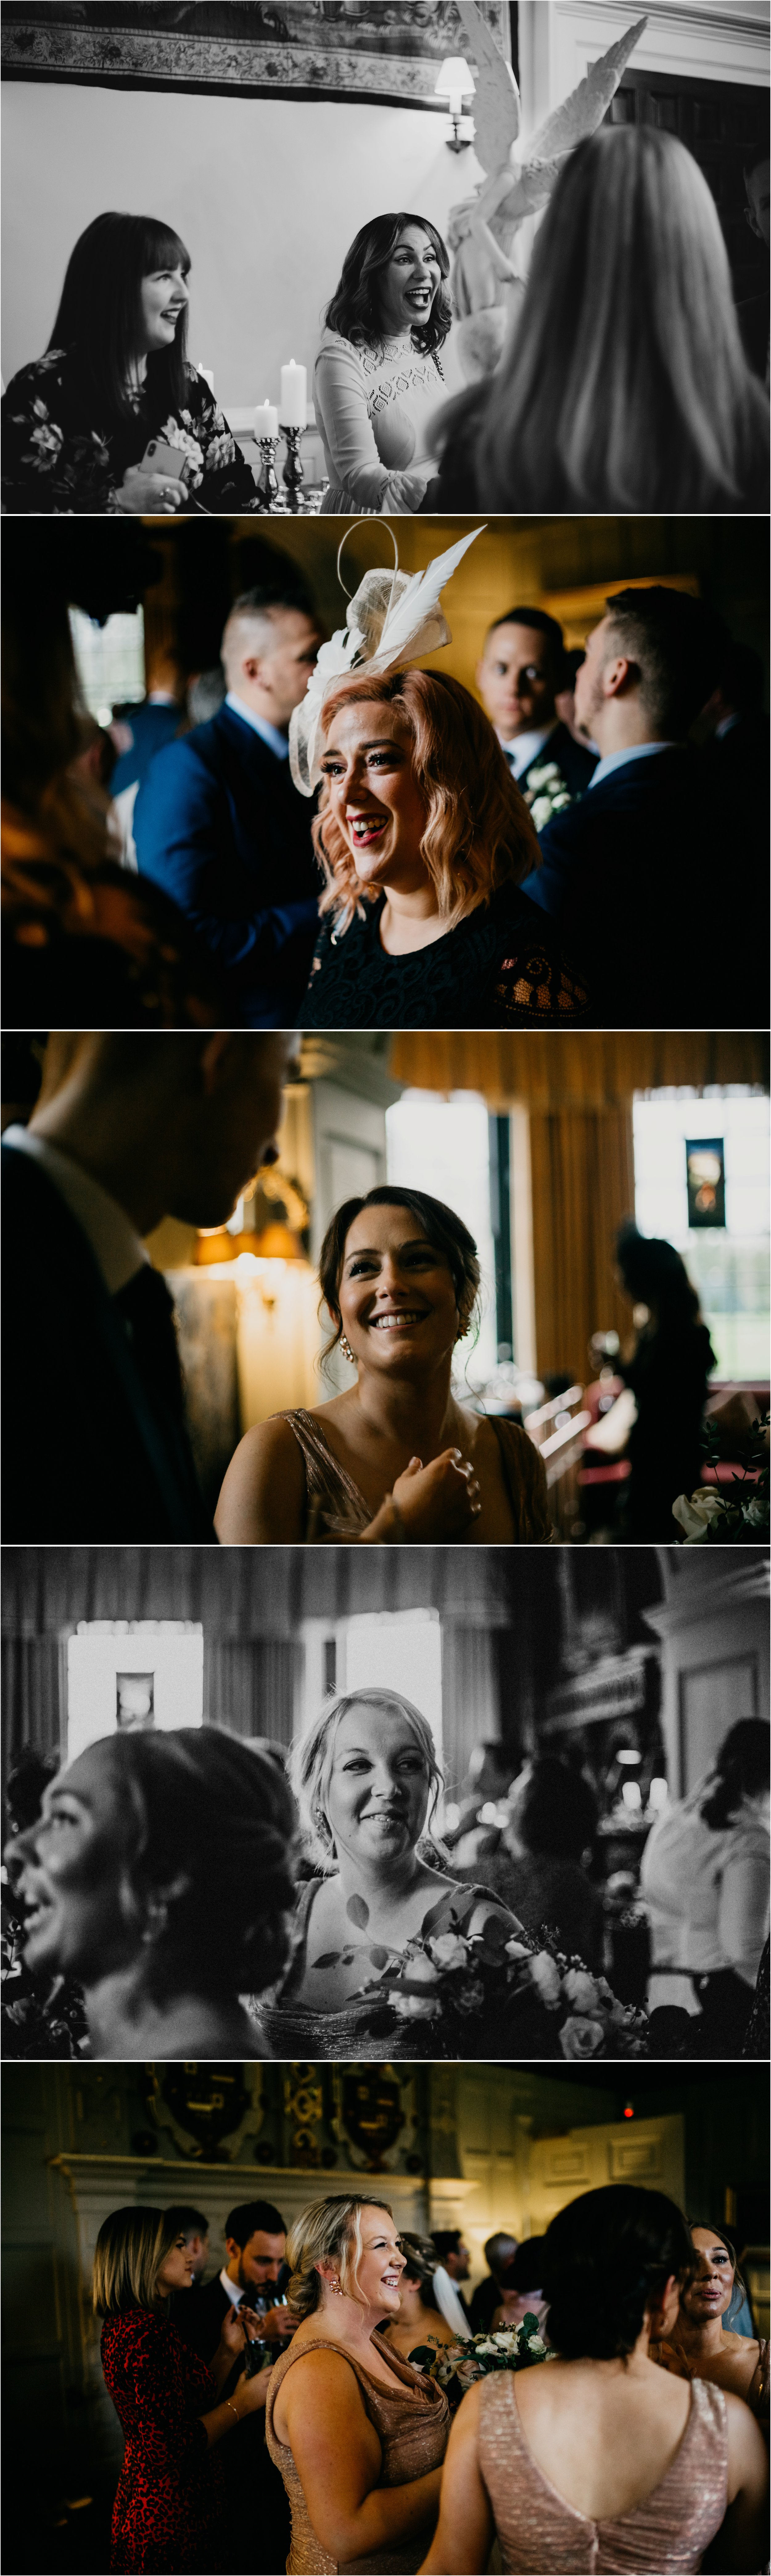 Elmore Court documentary wedding photography_0091.jpg